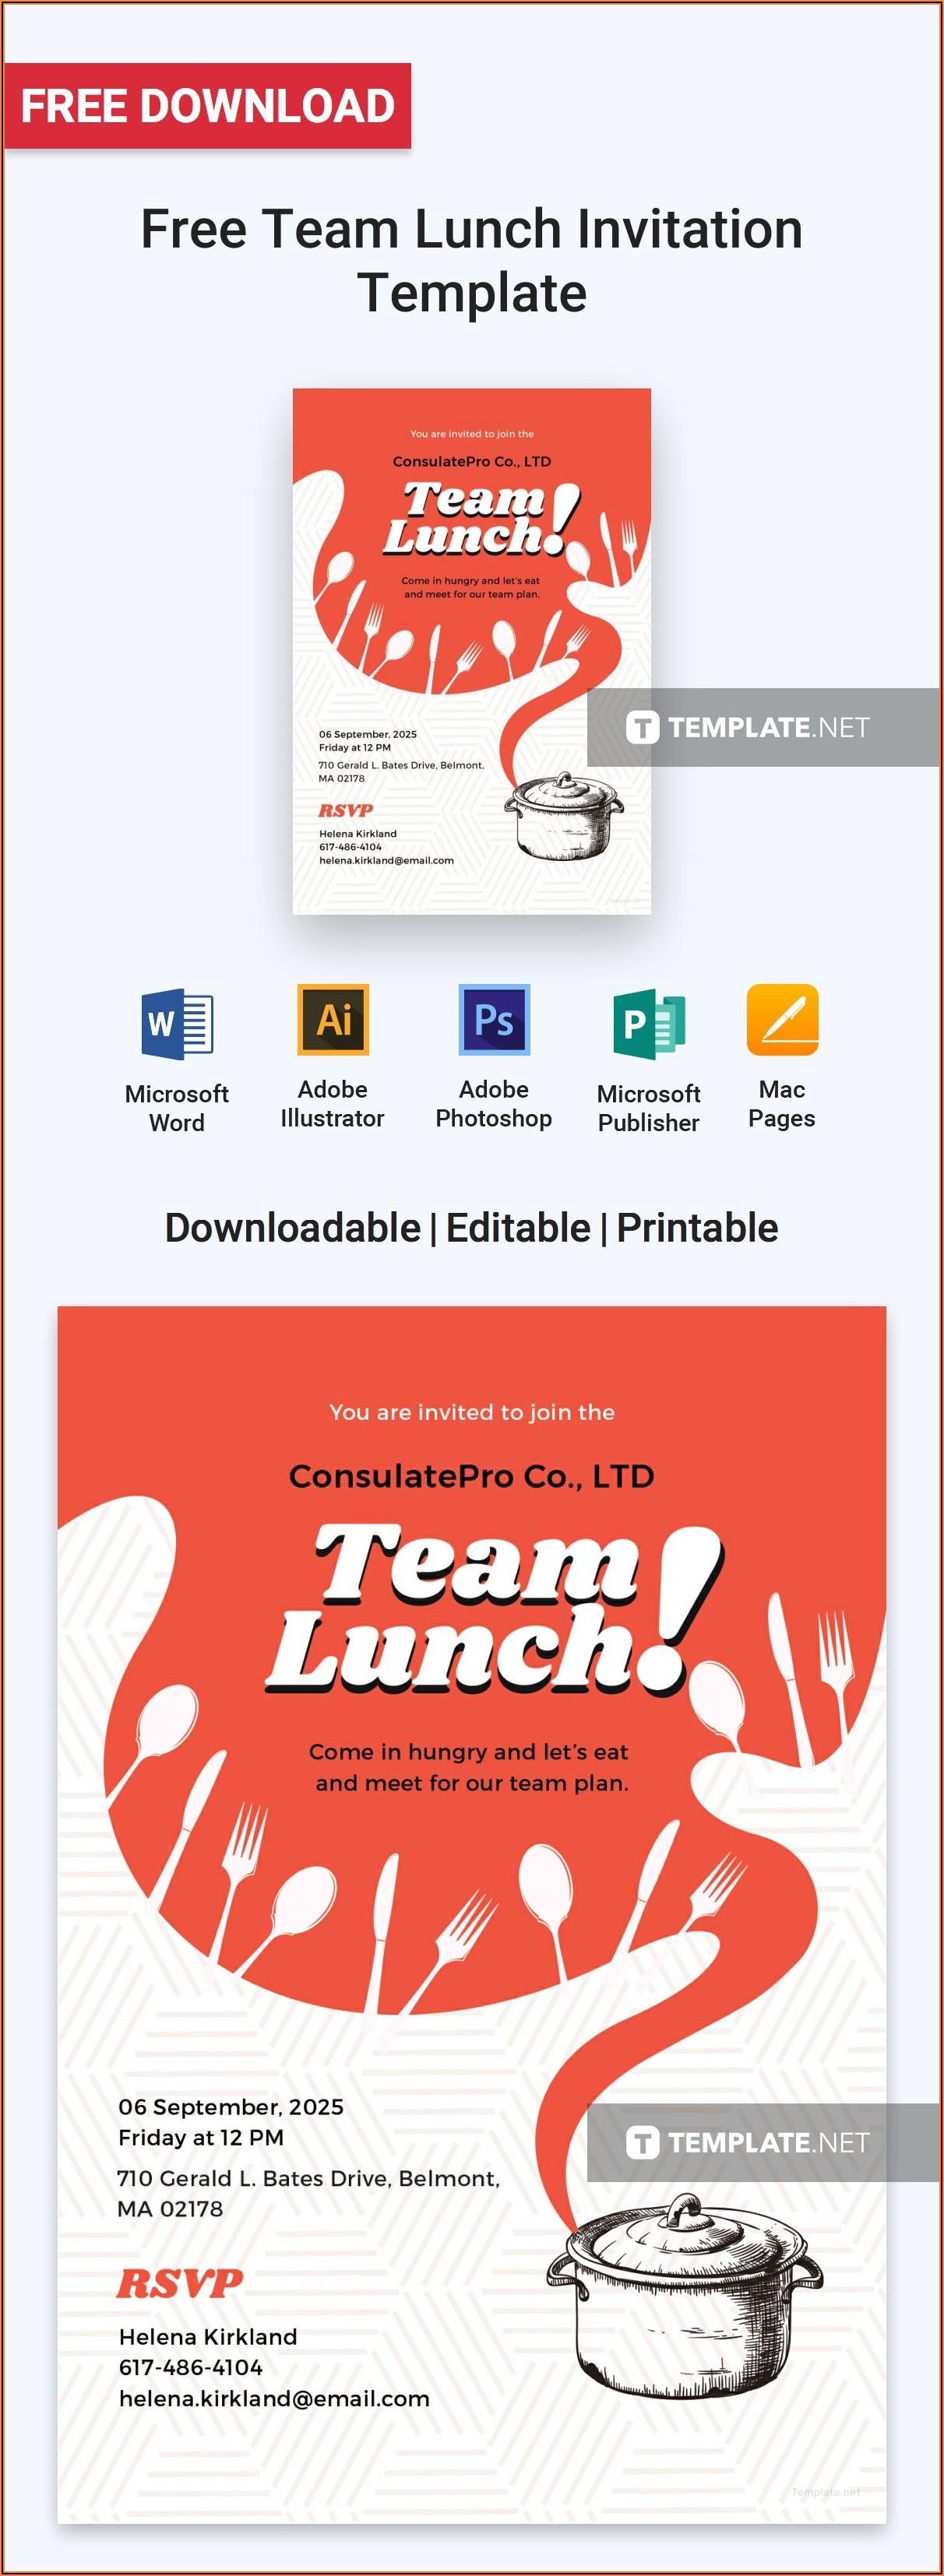 Free Team Lunch Invitation Template Editable